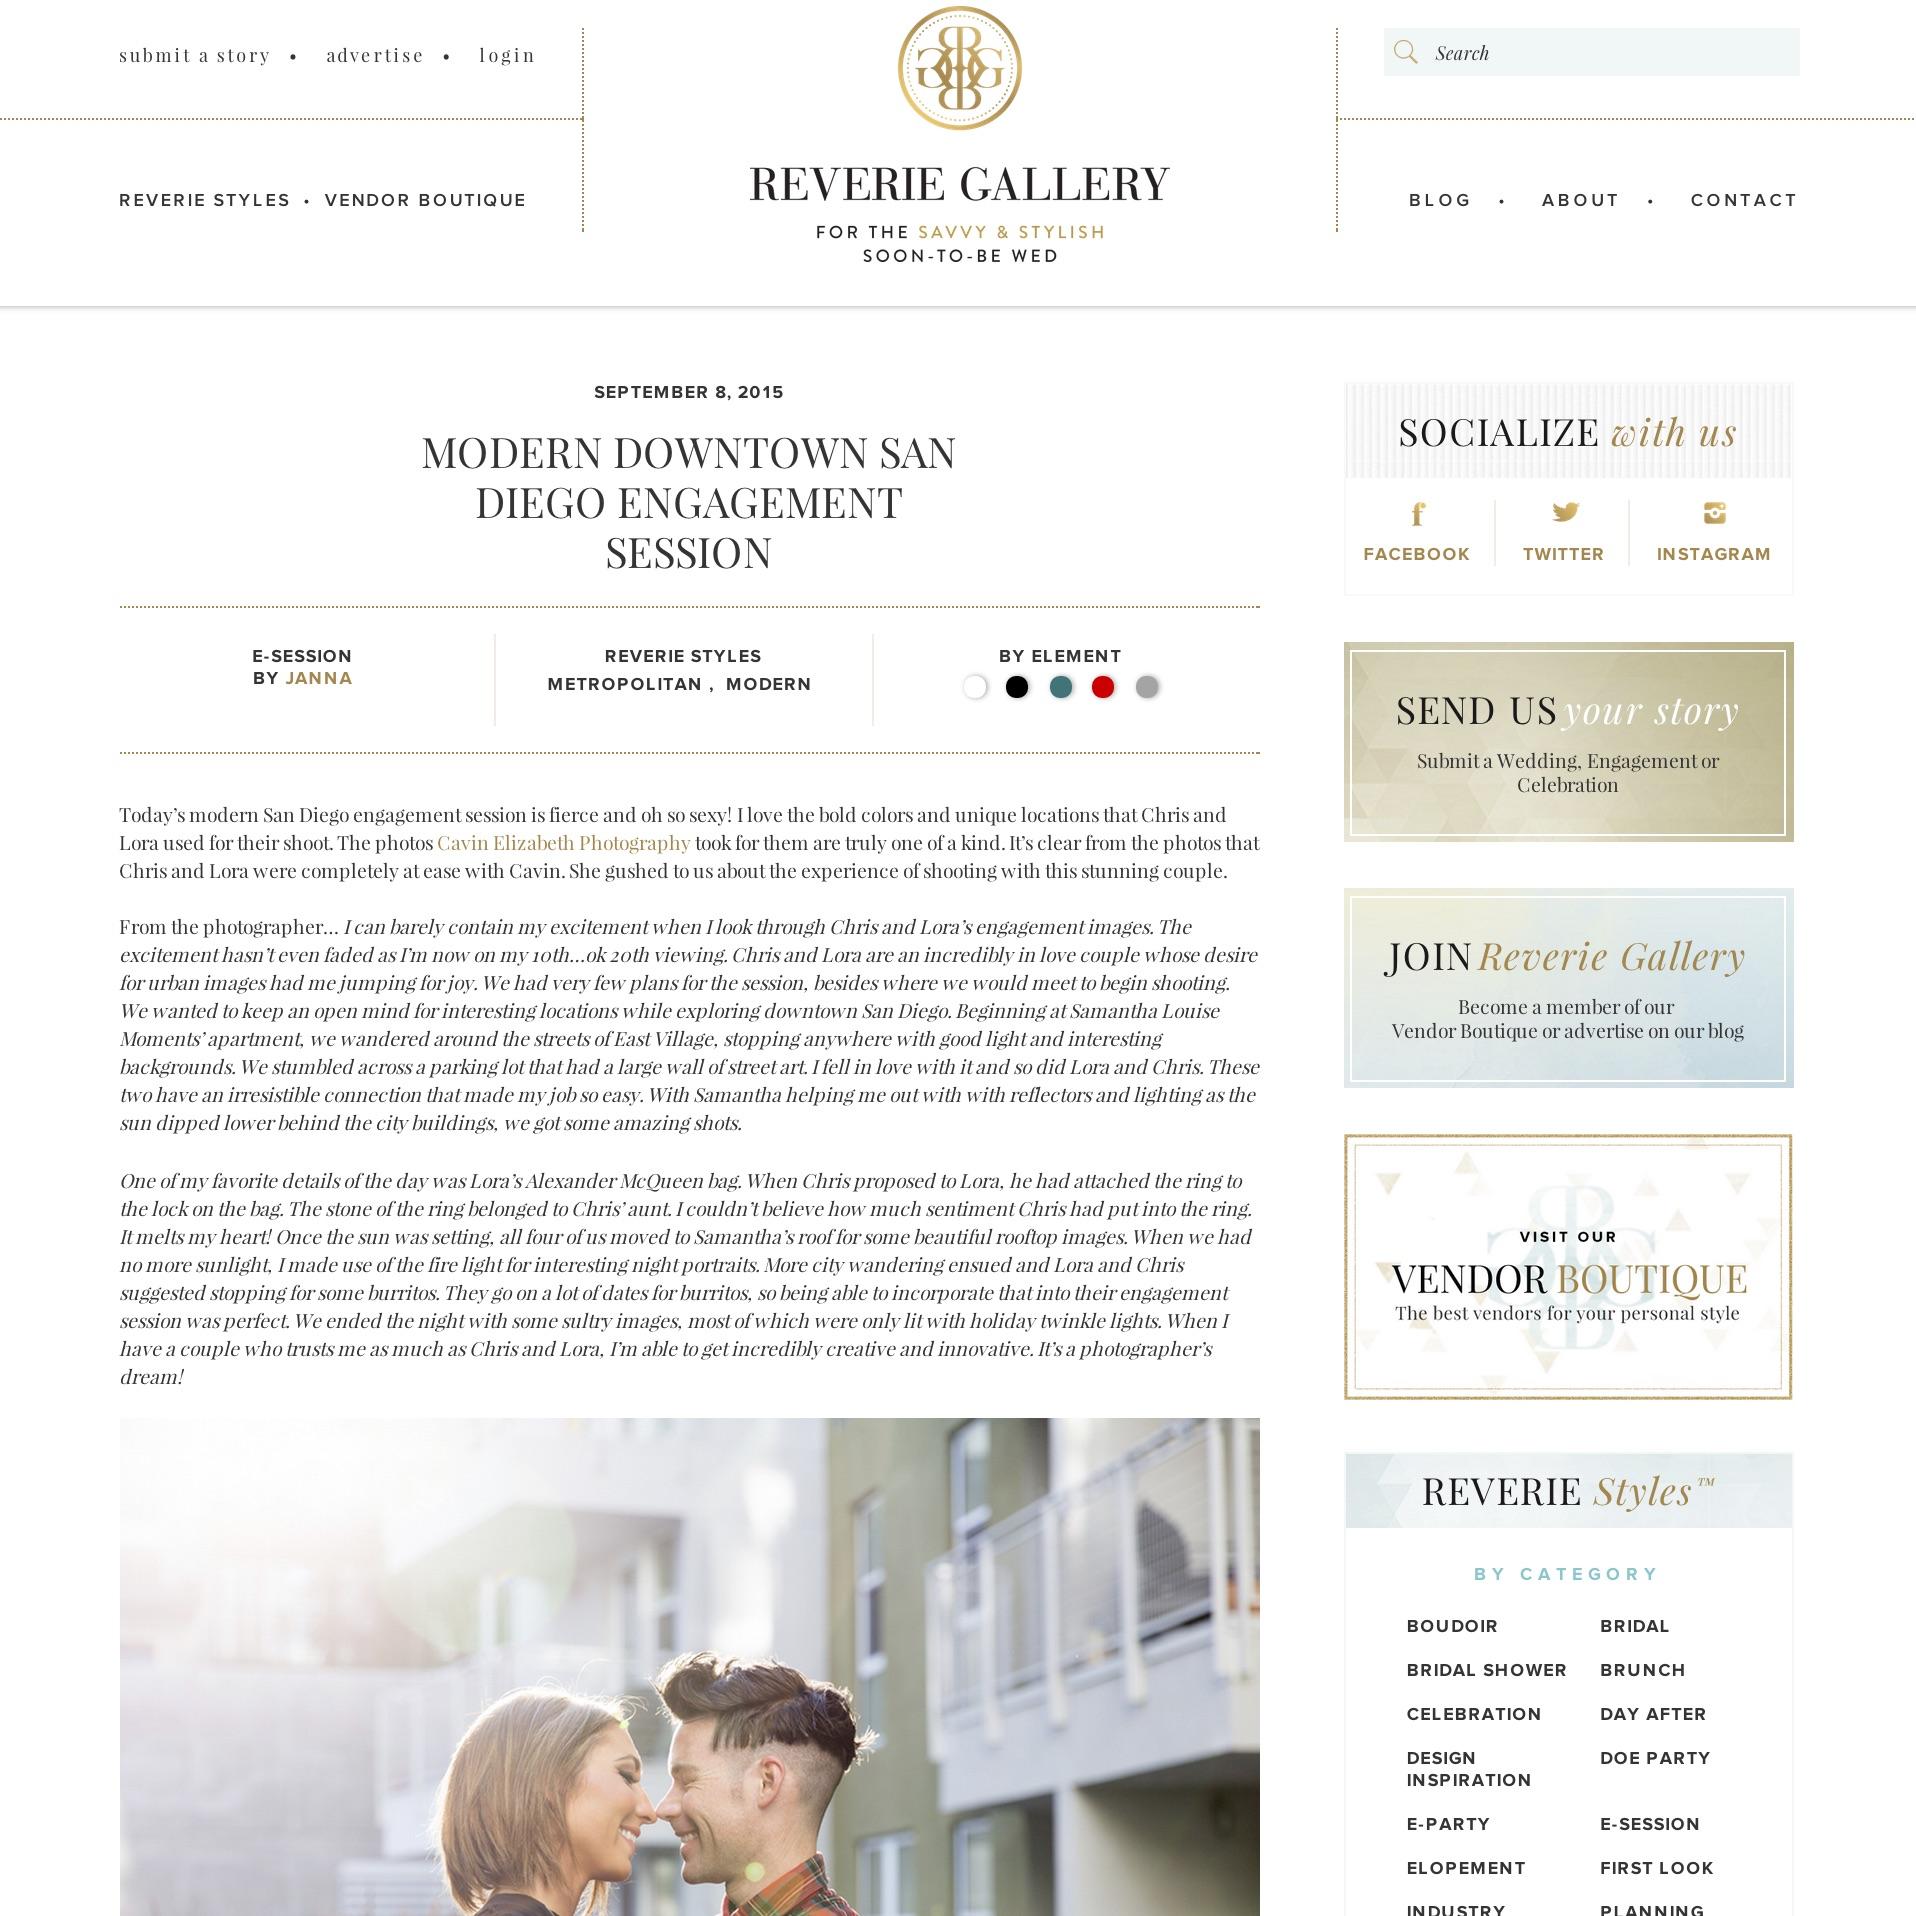 San Diego wedding photographer featured on Reverie Gallery press blog